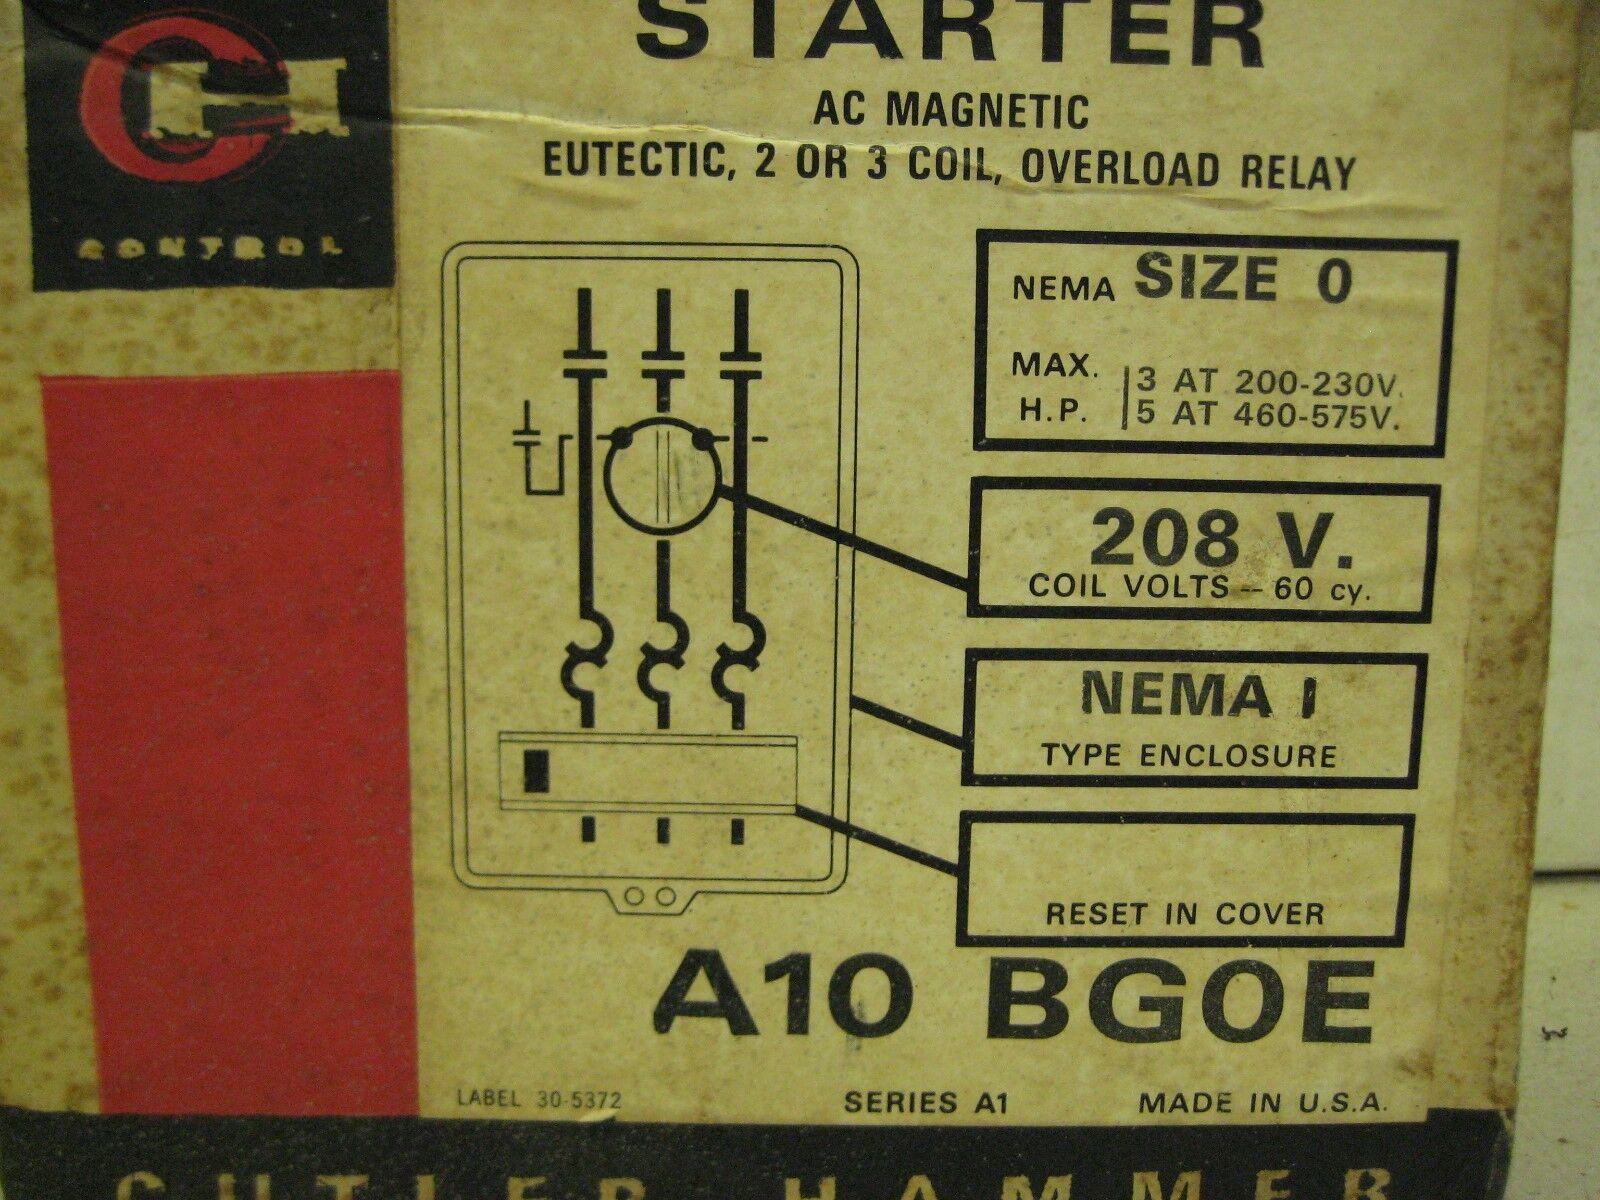 NEW CUTLER-HAMMER MAGNETIC A10BGOE SIZE 0 STARTER 208v NEMA TYPE ENCLOSURE